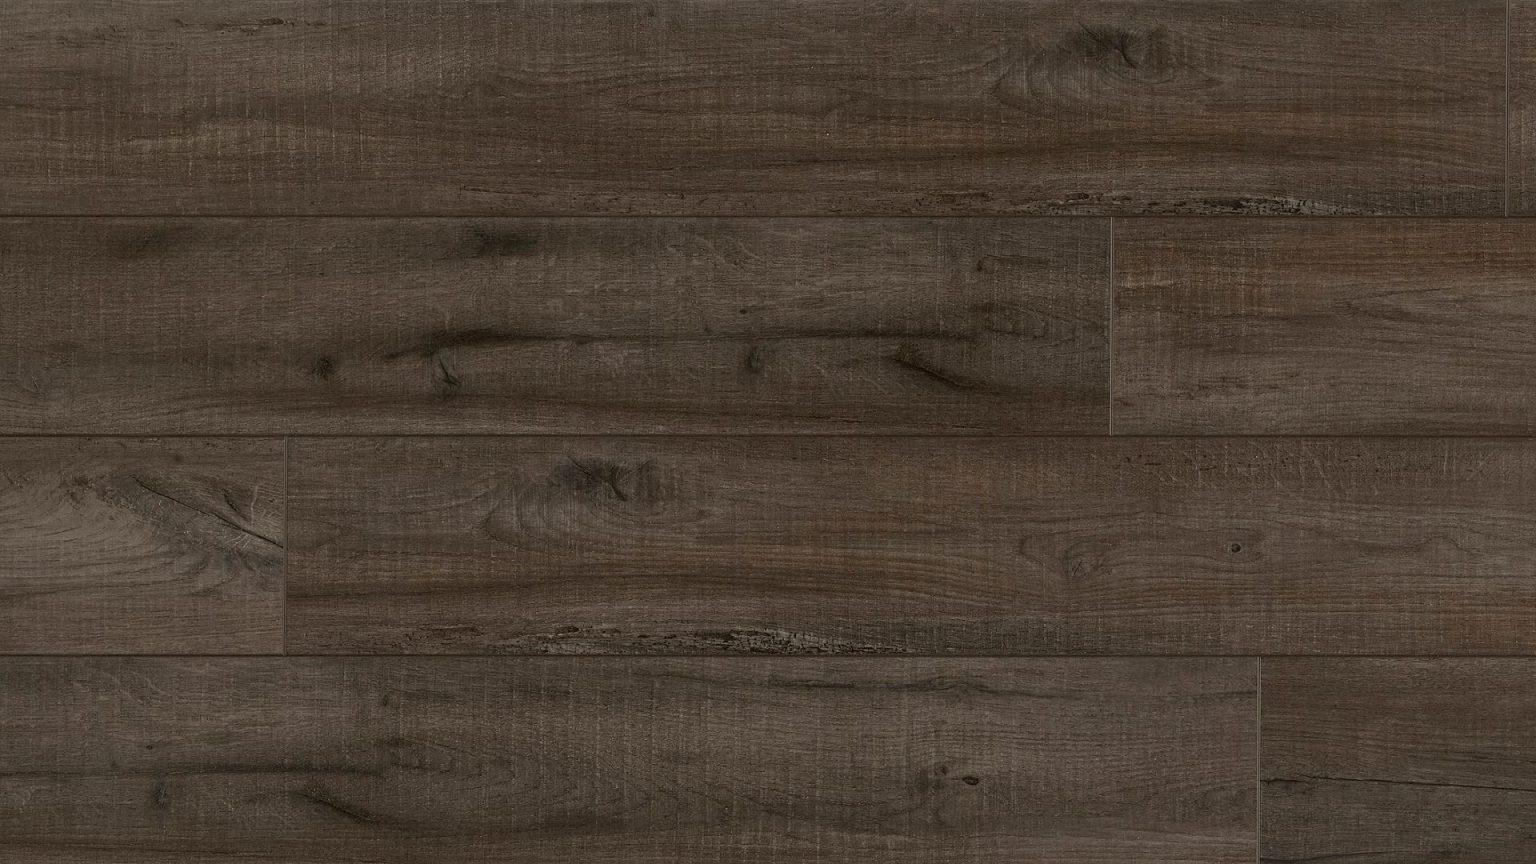 Nueltin 50 LVRE 122 / COREtec® authentics wood